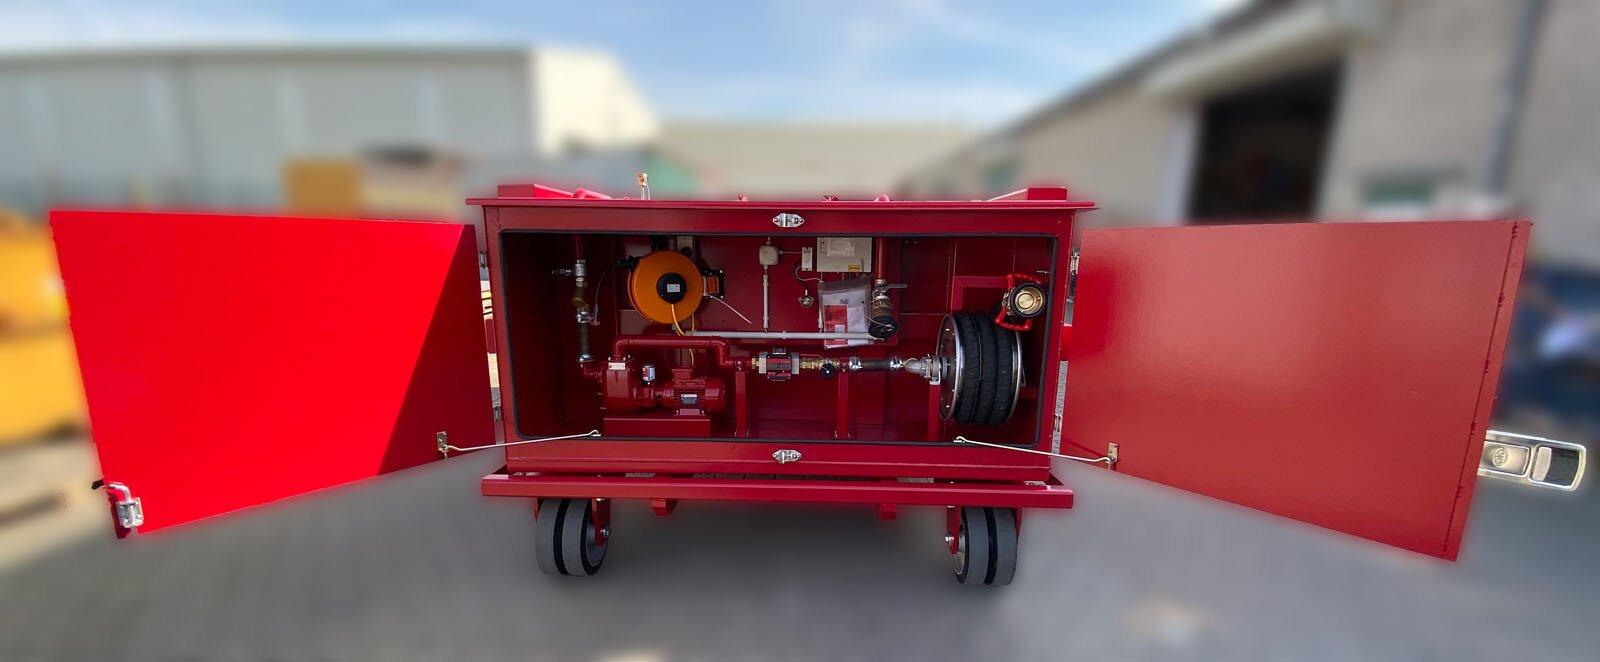 Bergbau Tankcontainer mit Hakensystem